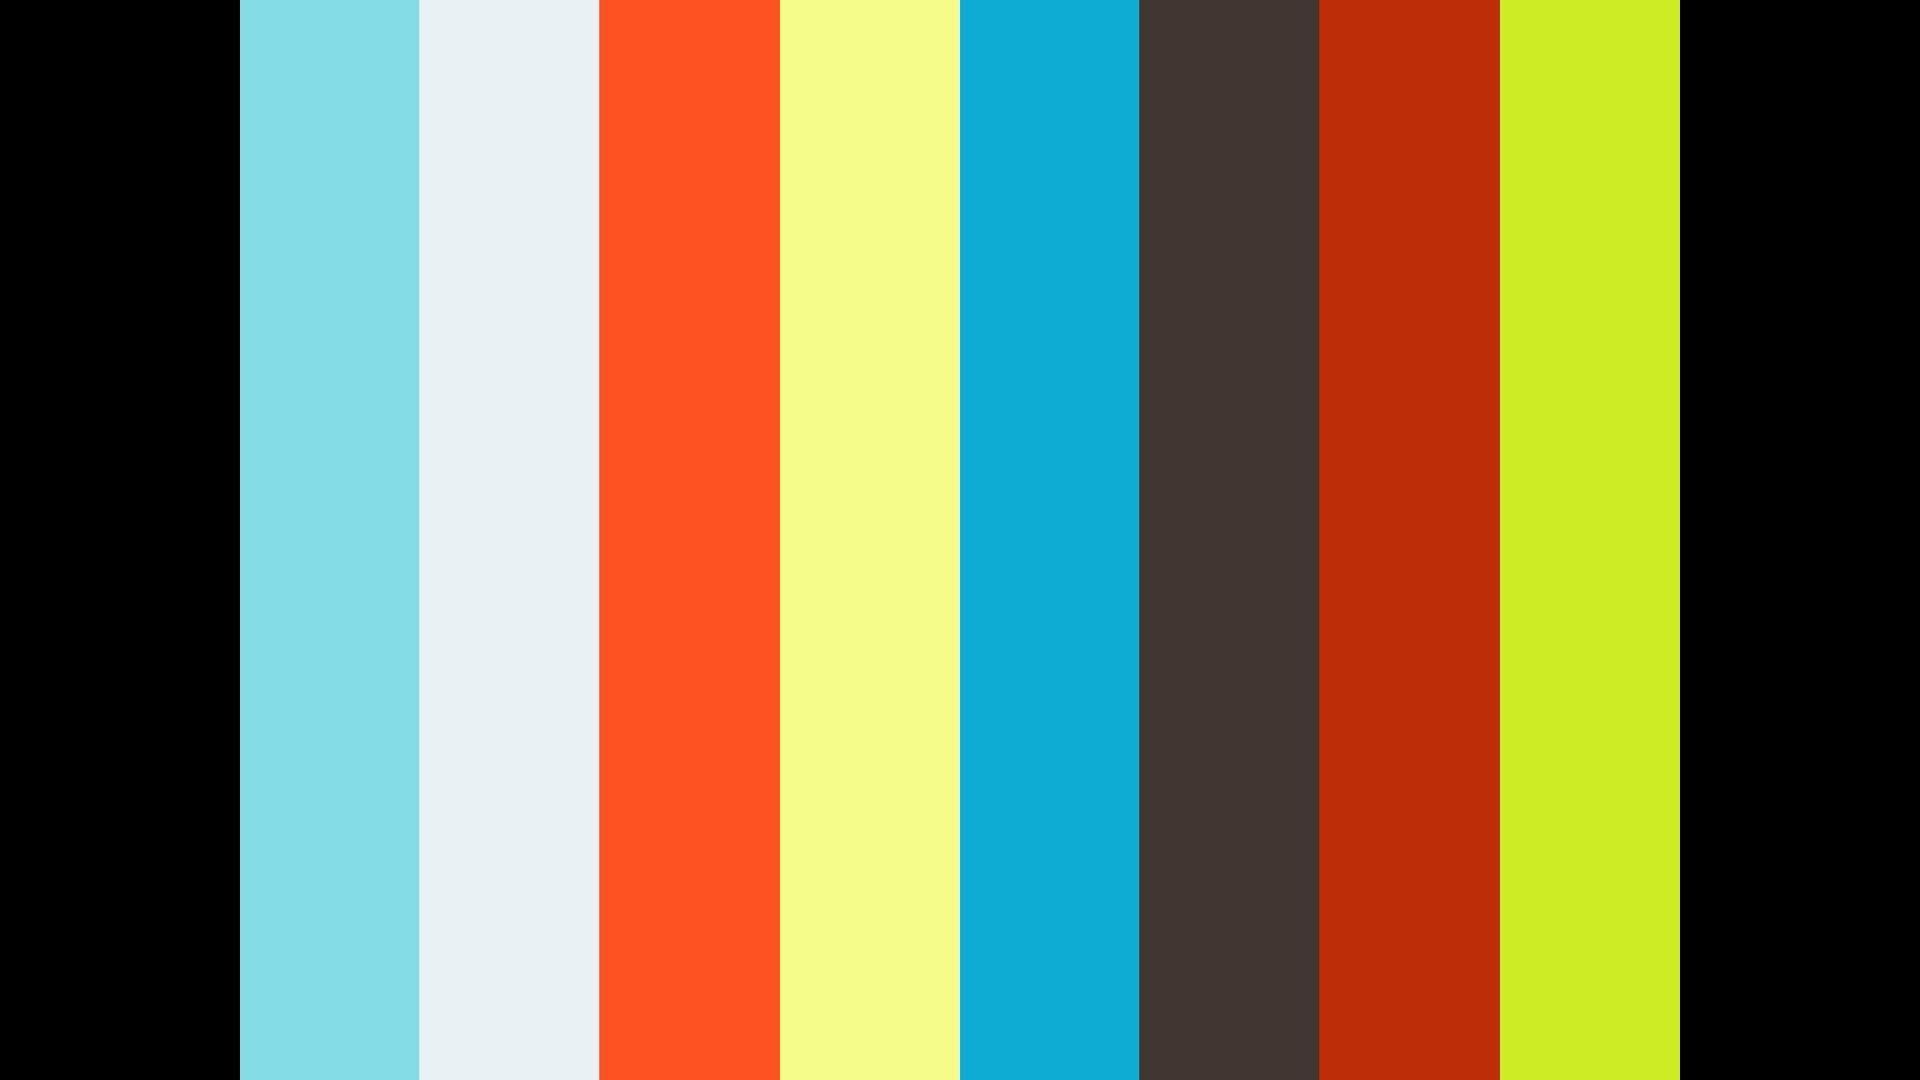 2021_05_10 - Brad - SCOOP 1k Series Saver Part 2